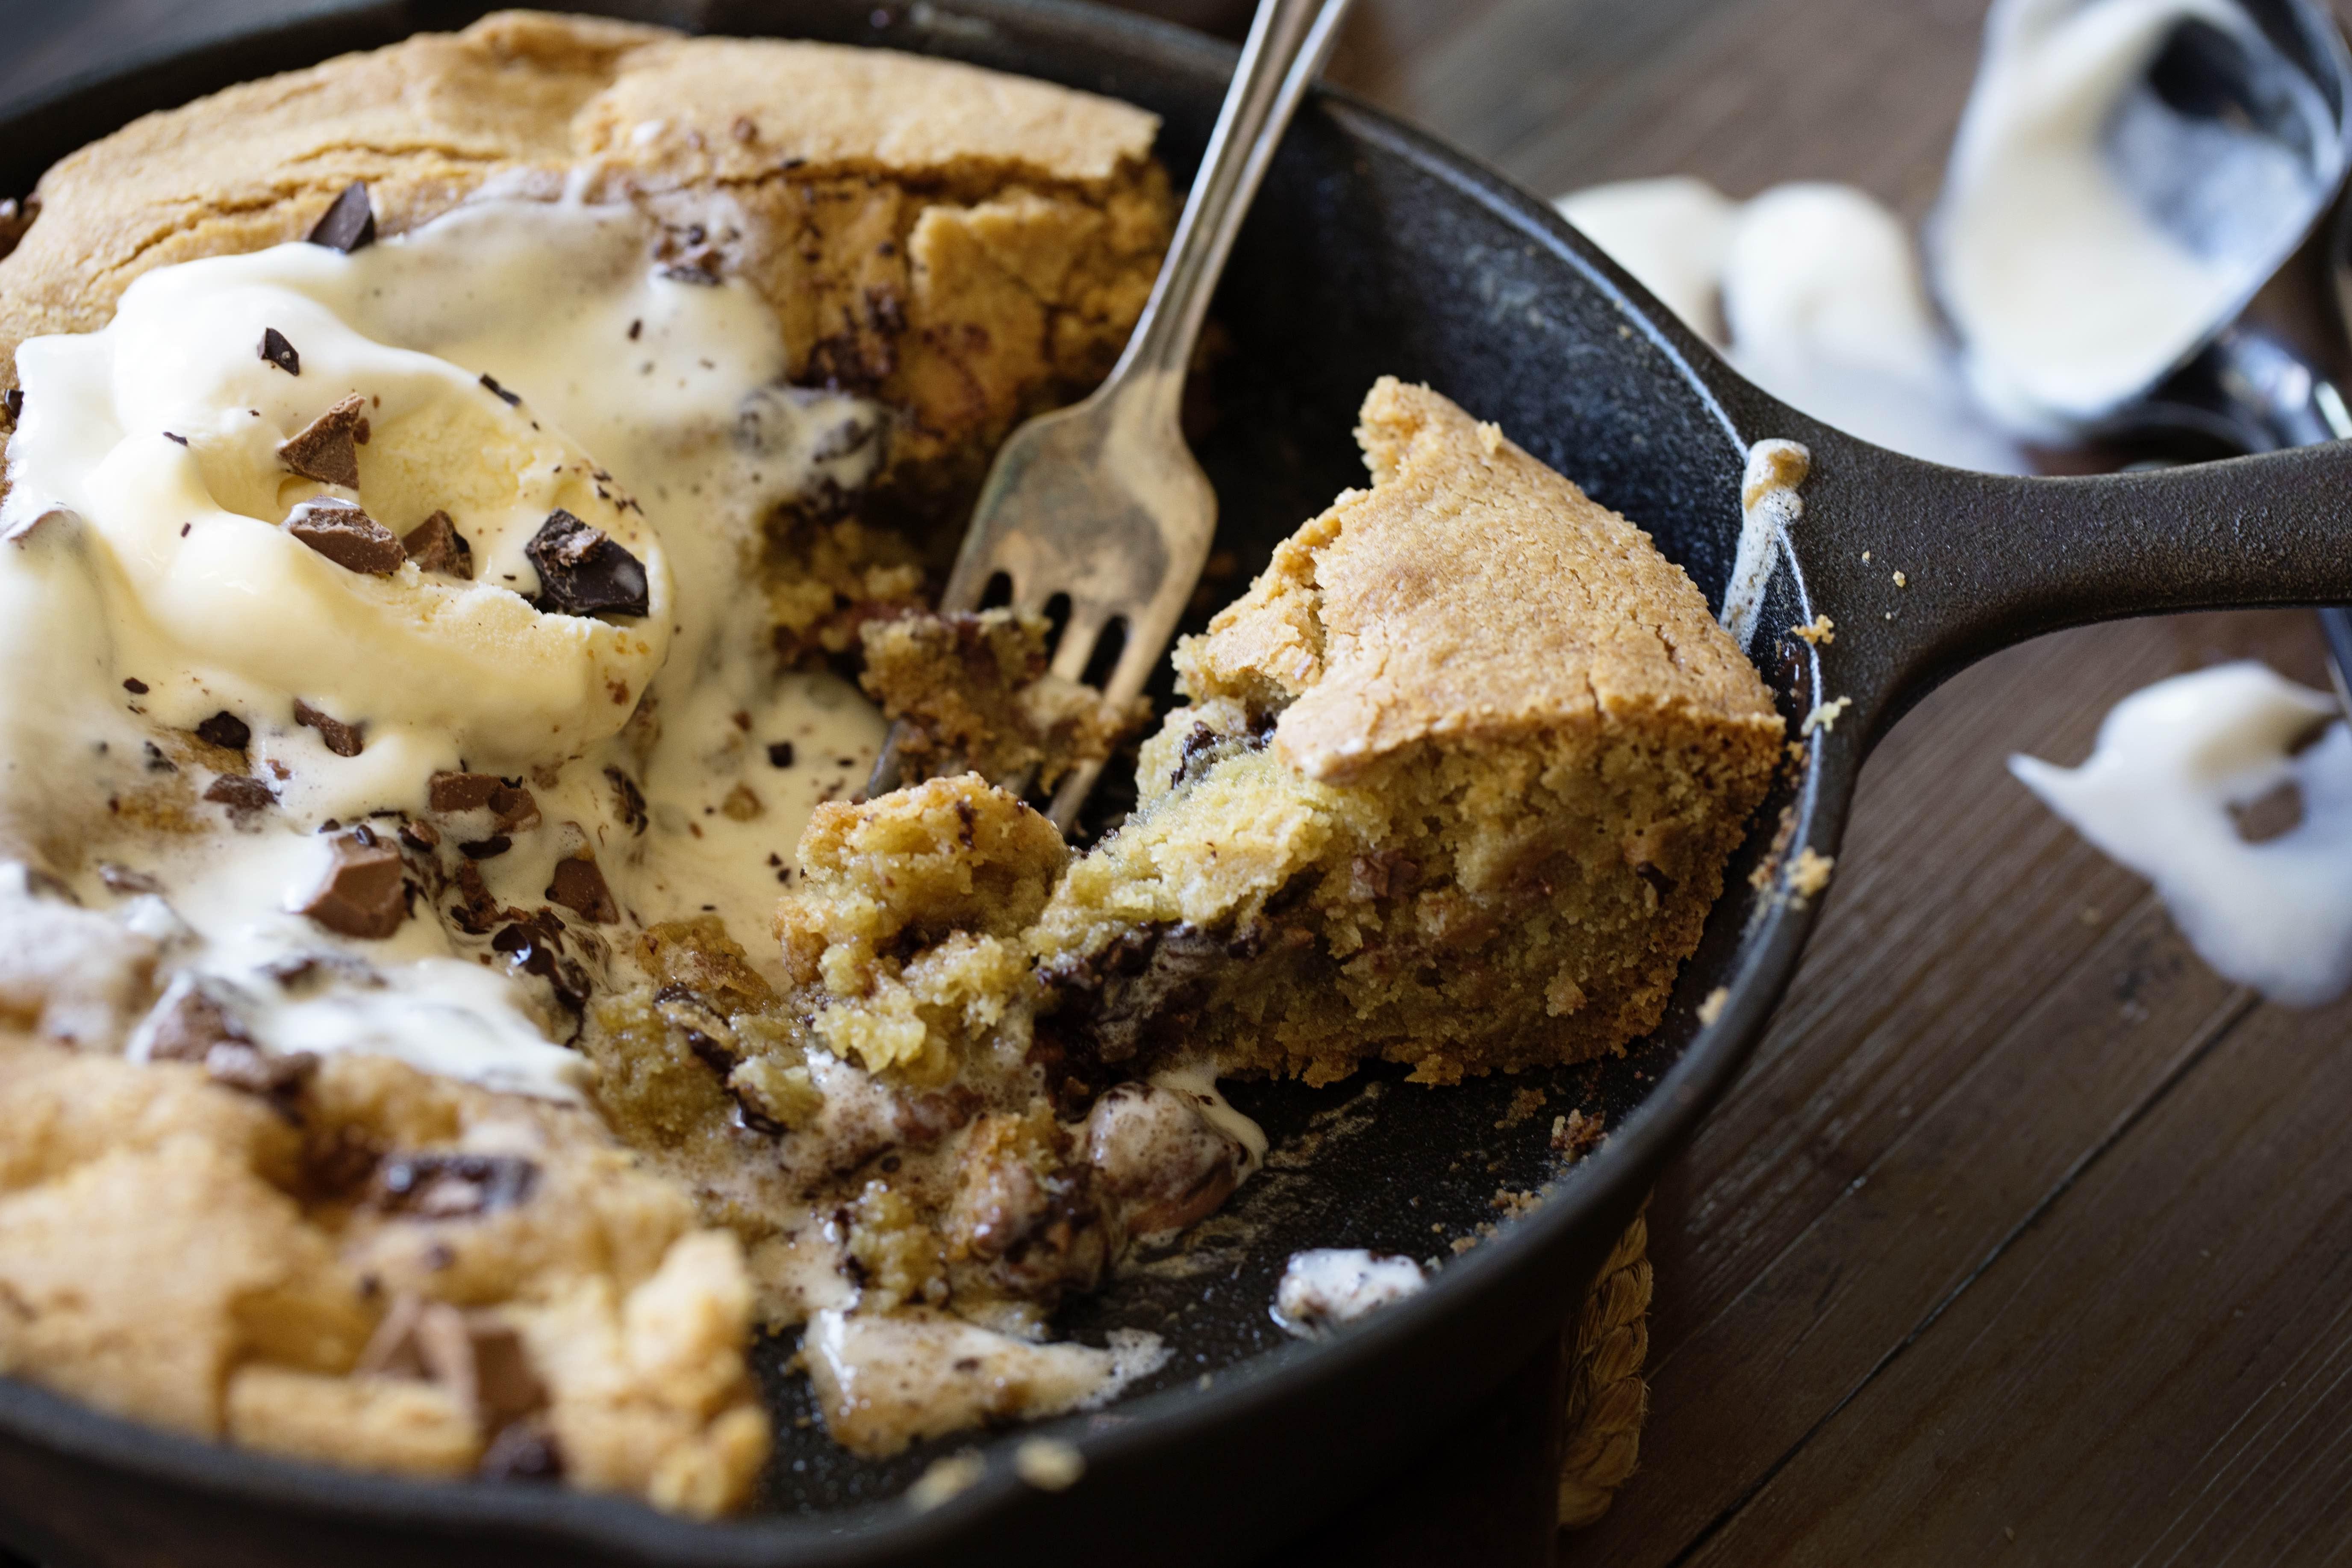 Skillet Cookie 2 Resize